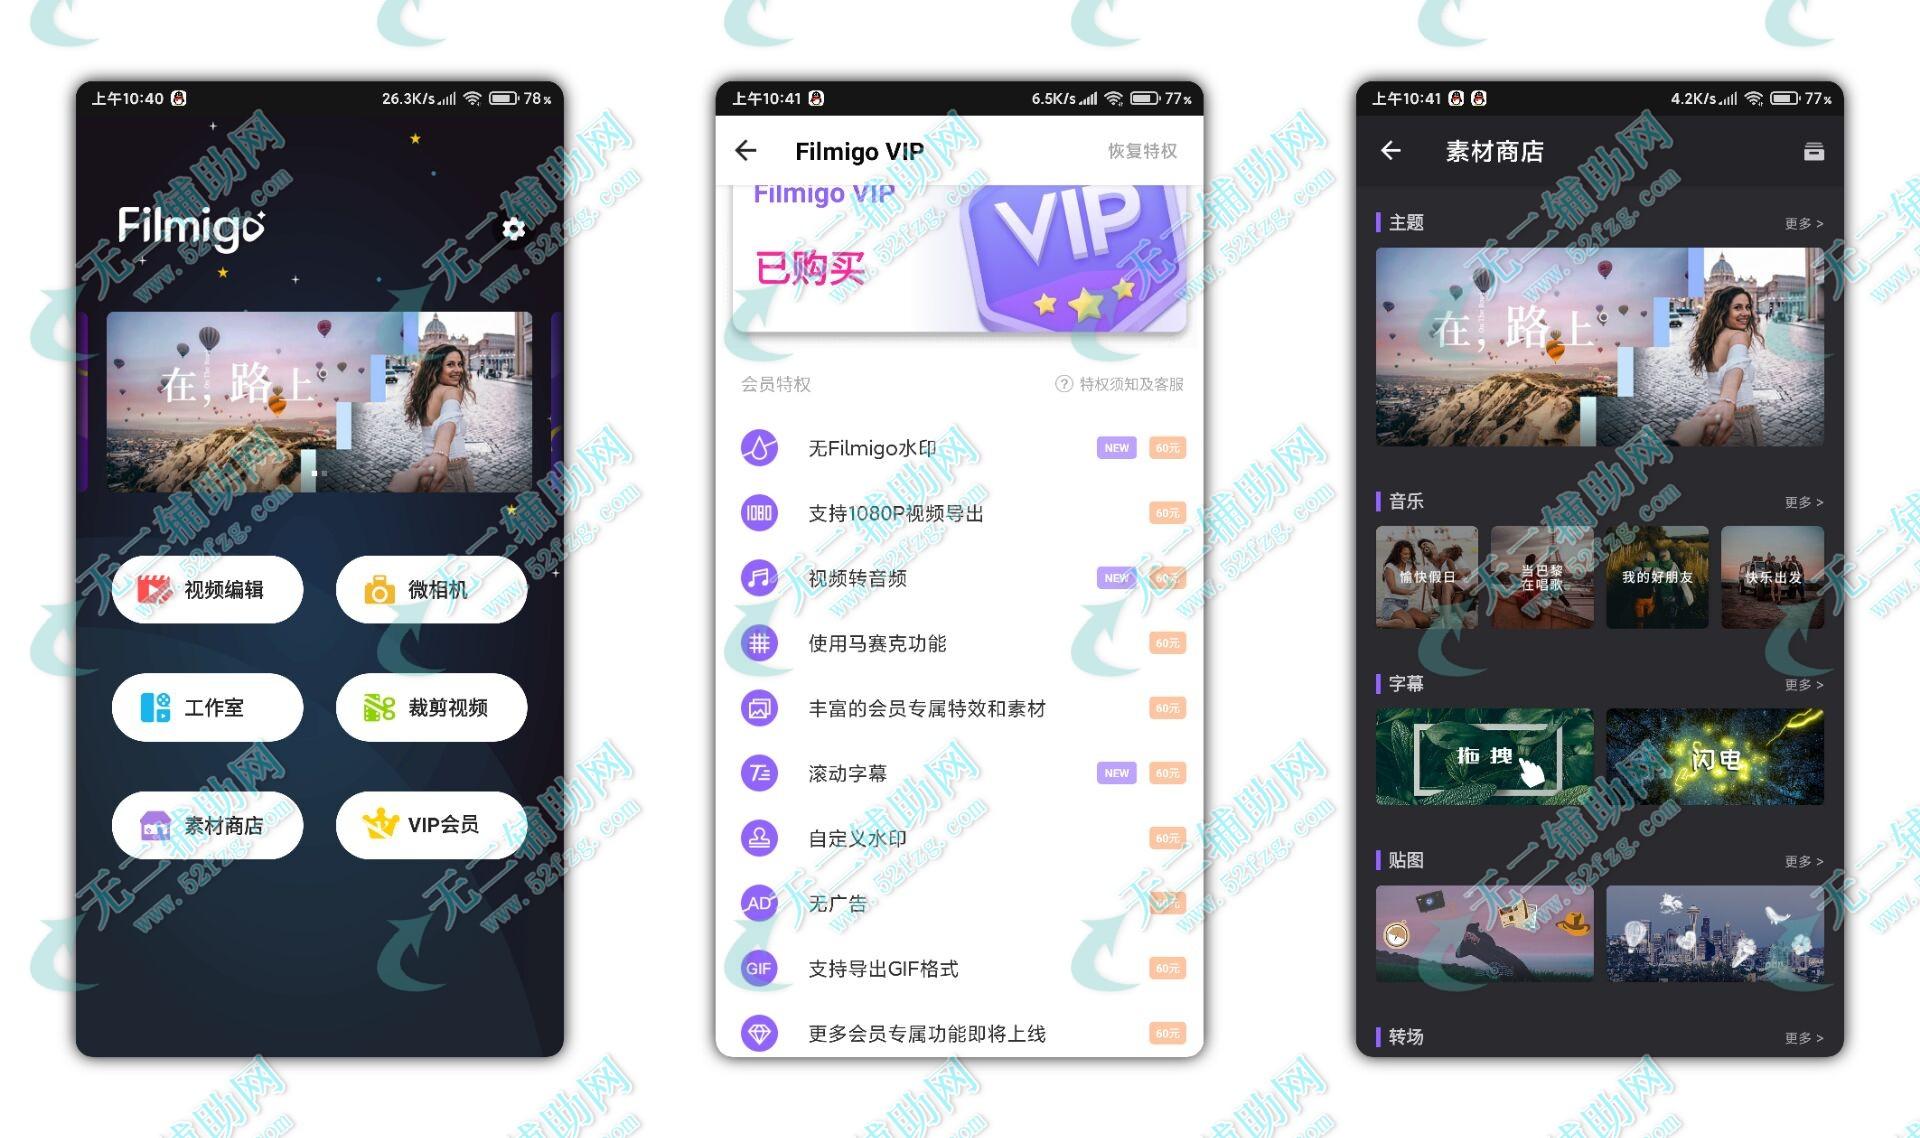 Filmigo视频剪辑VIP修改版v4.9.3 cn 解锁全部付费功能